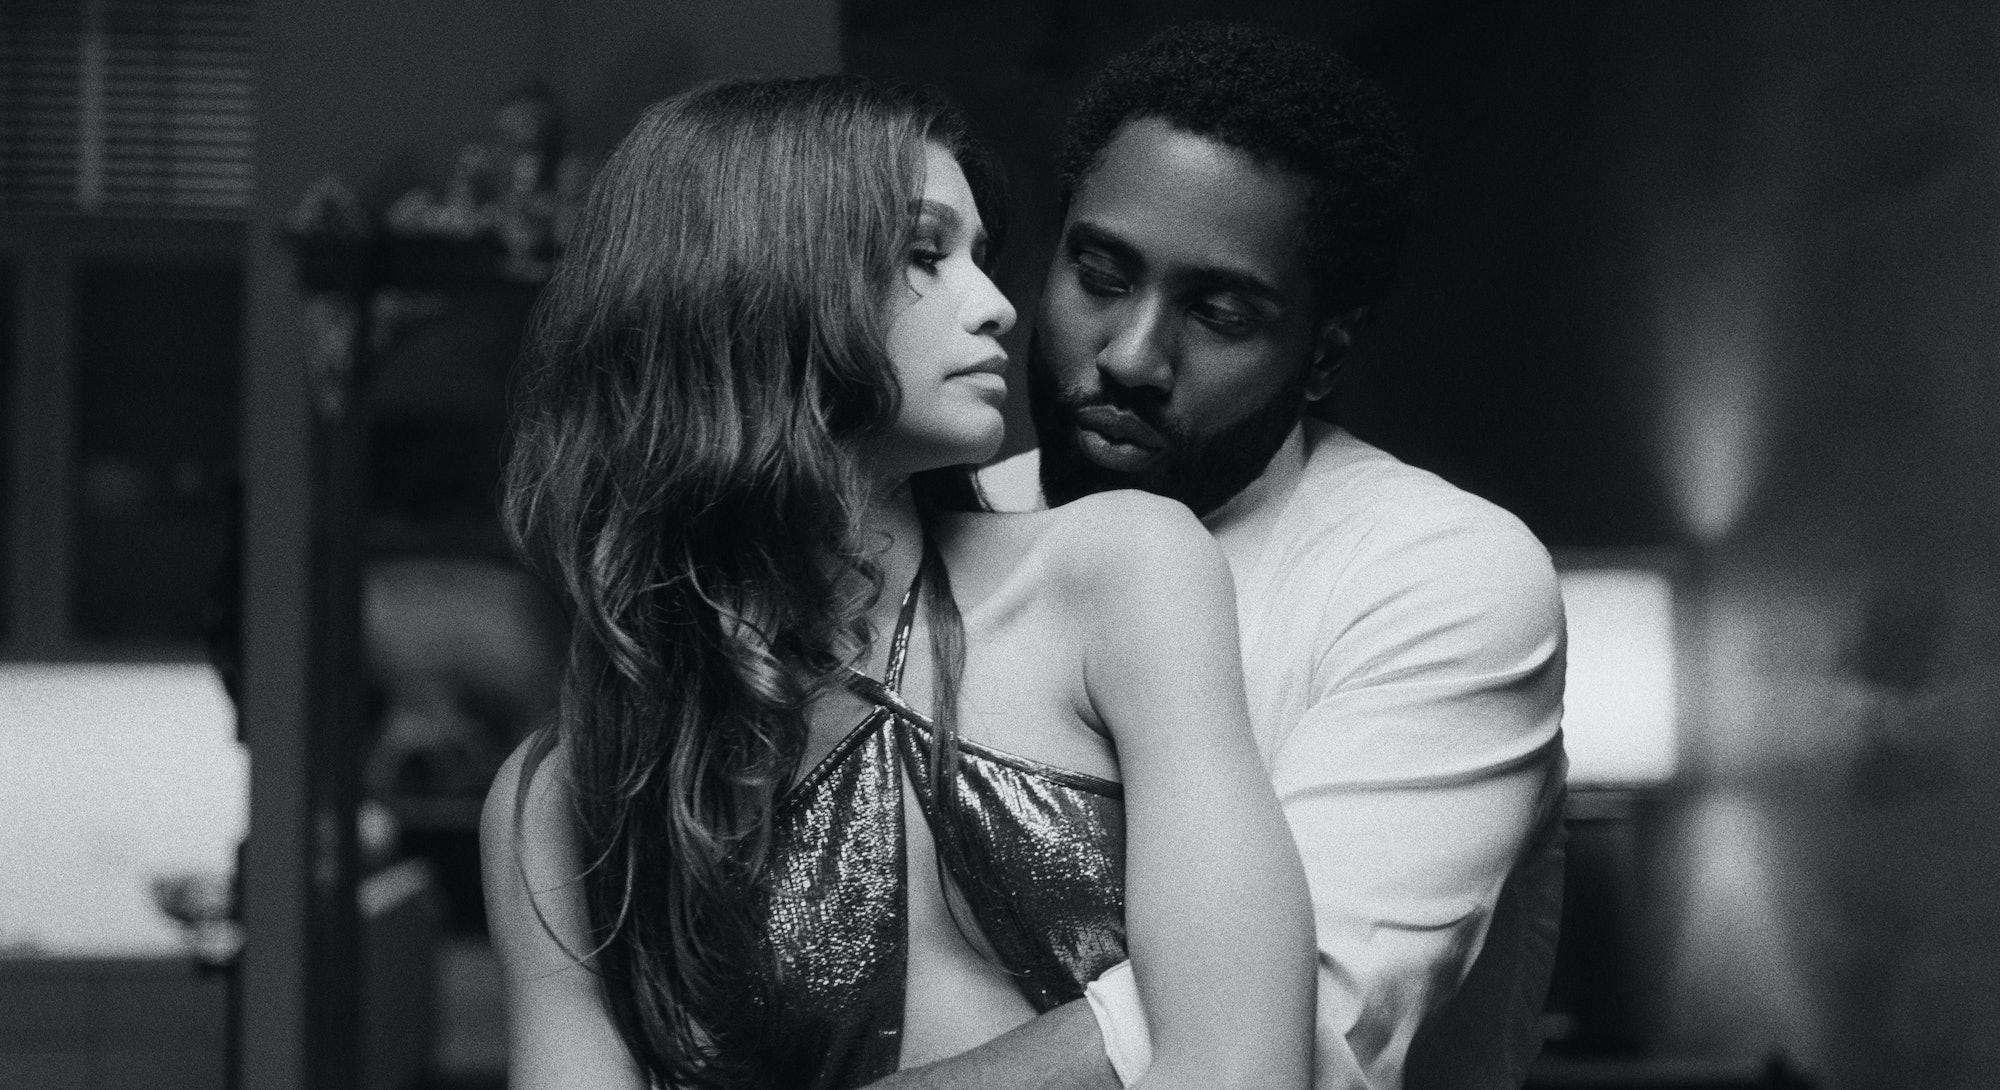 Zendaya and John David Washington in 'Malcolm & Marie,' via the Netflix press site.